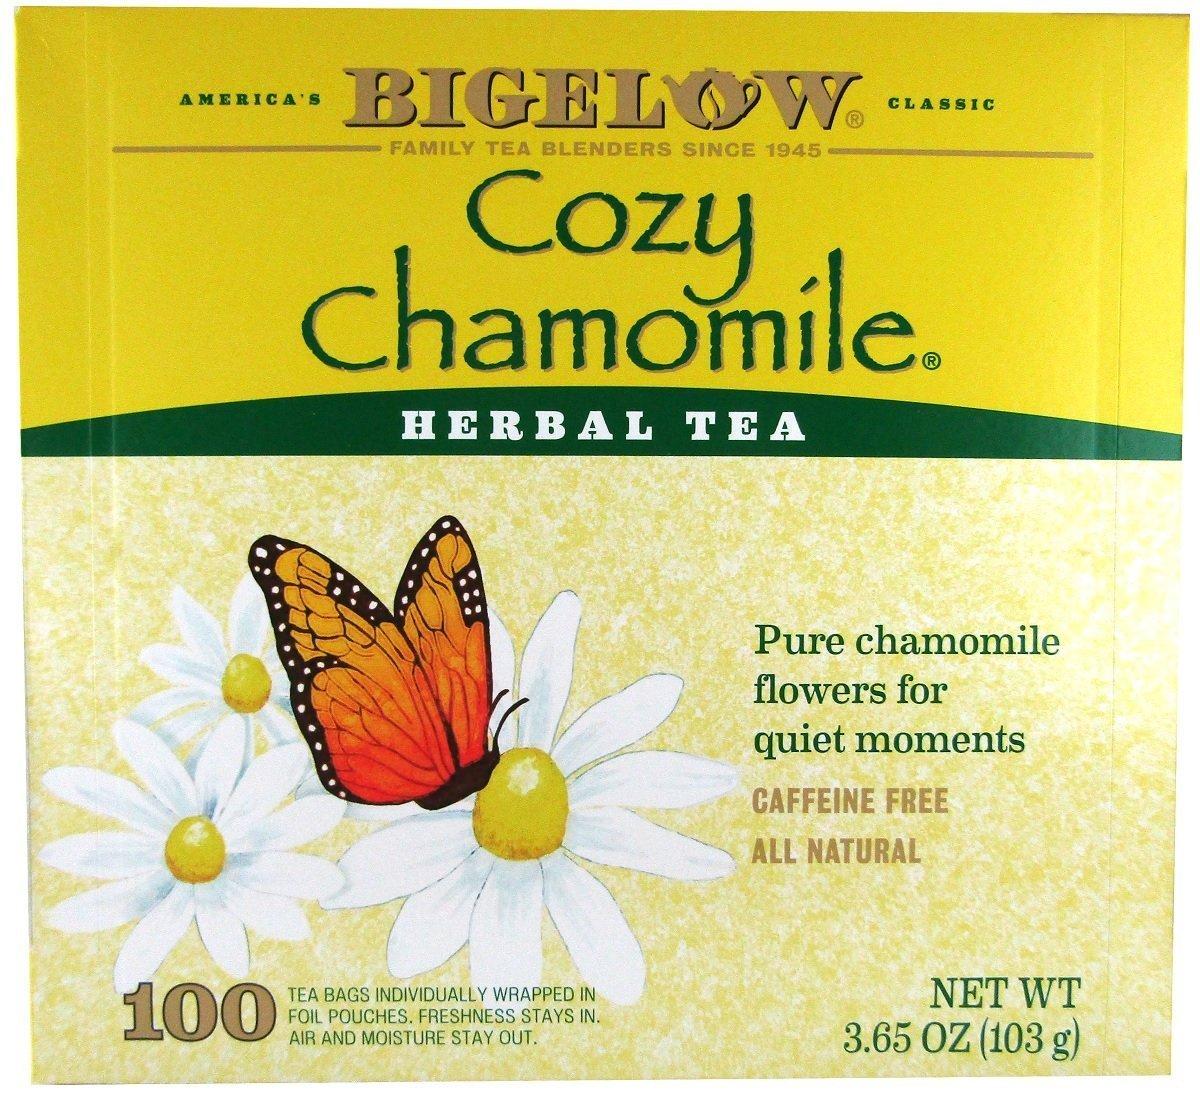 Bigelow Cozy Chamomile Herbal Tea, 100 count box tea bags